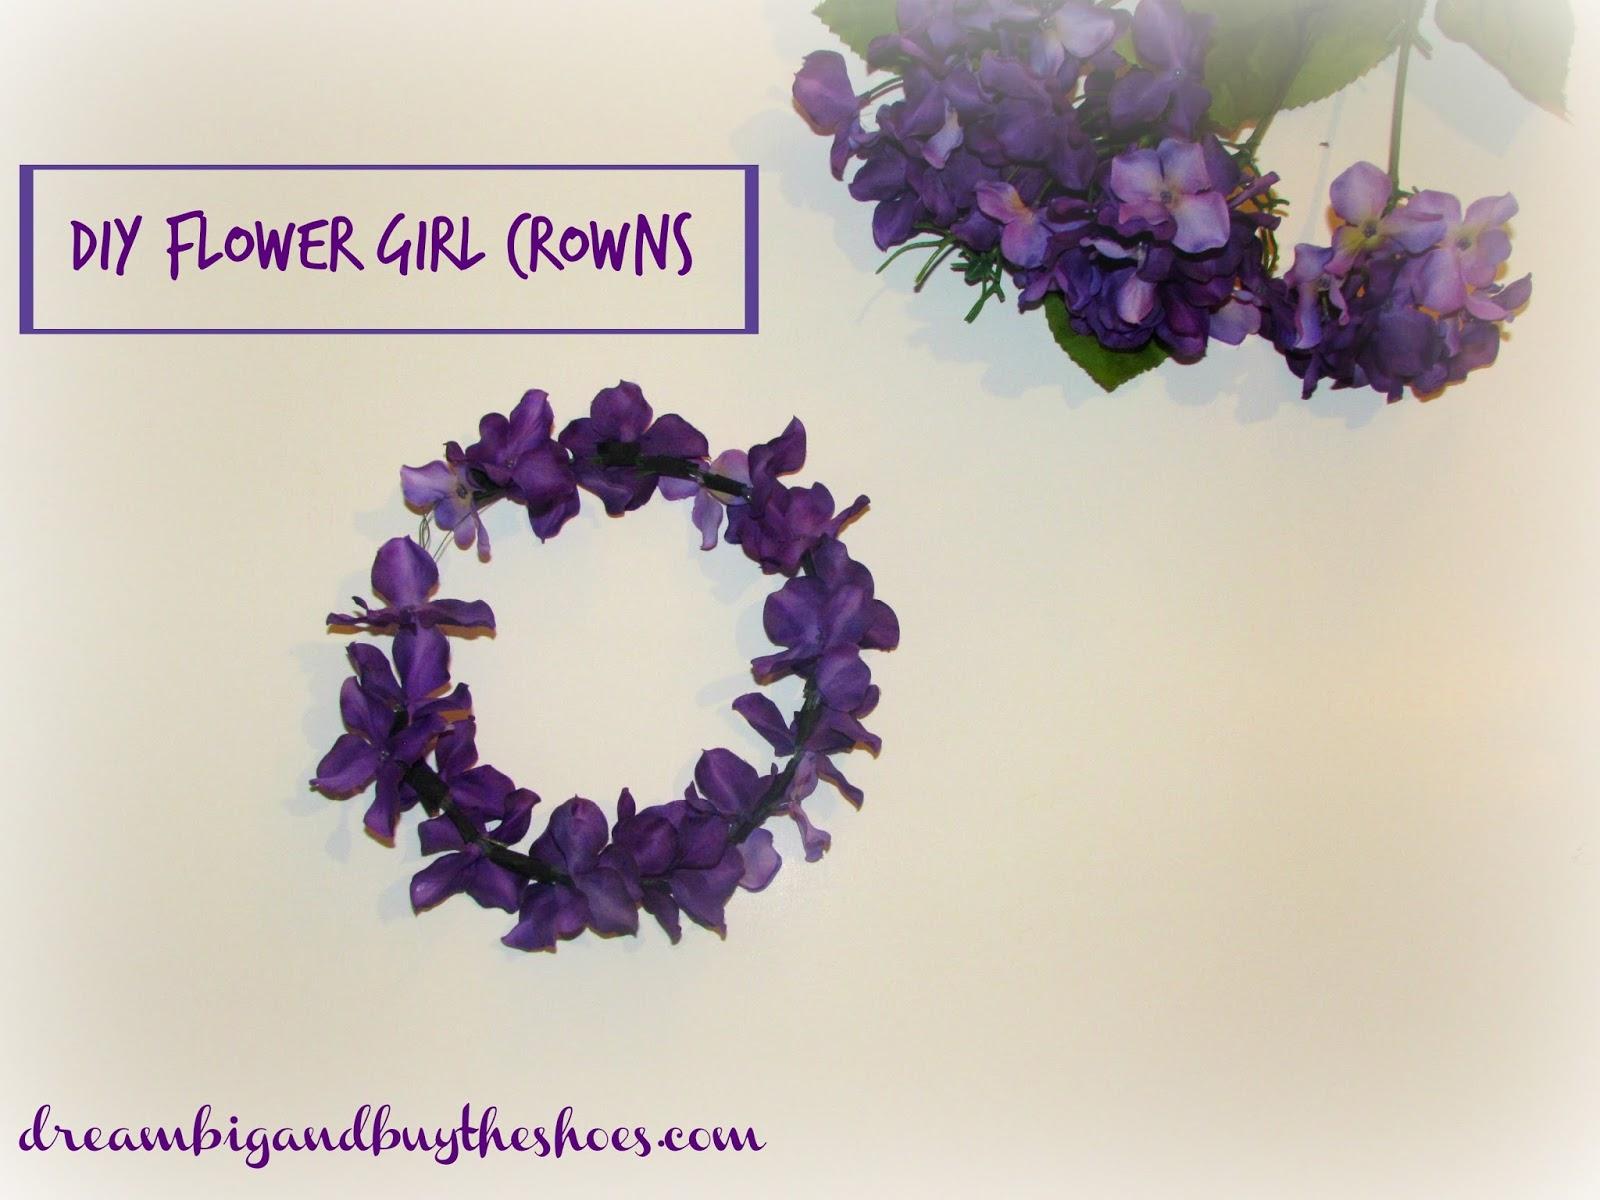 Diy flower crowns dream big buy the shoes diy flower crowns izmirmasajfo Images